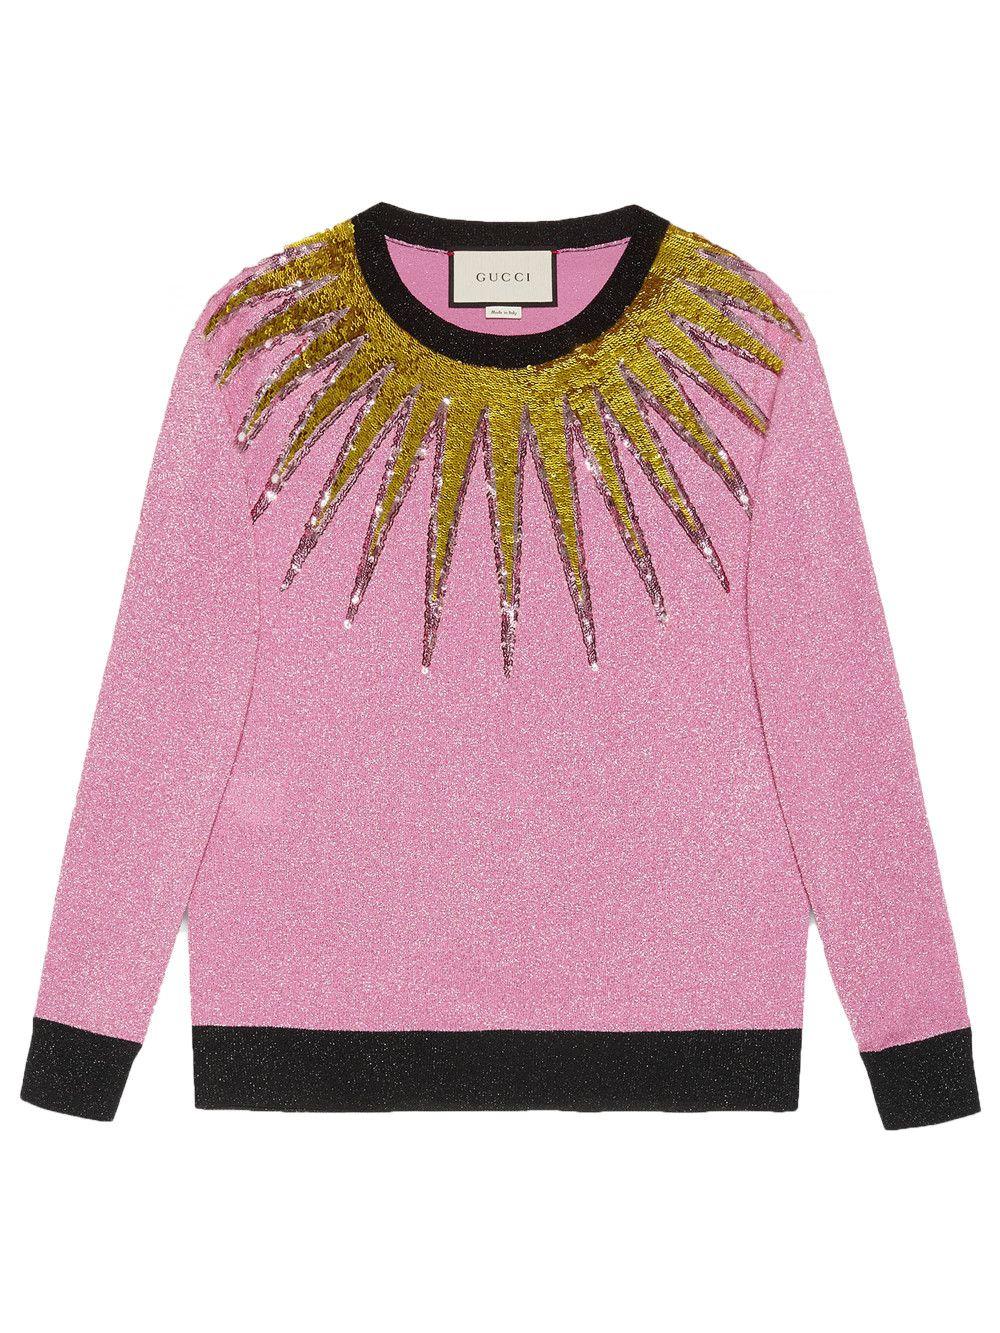 gucci  cloth   Cardigan Sweaters For Women 53e6cbb7d